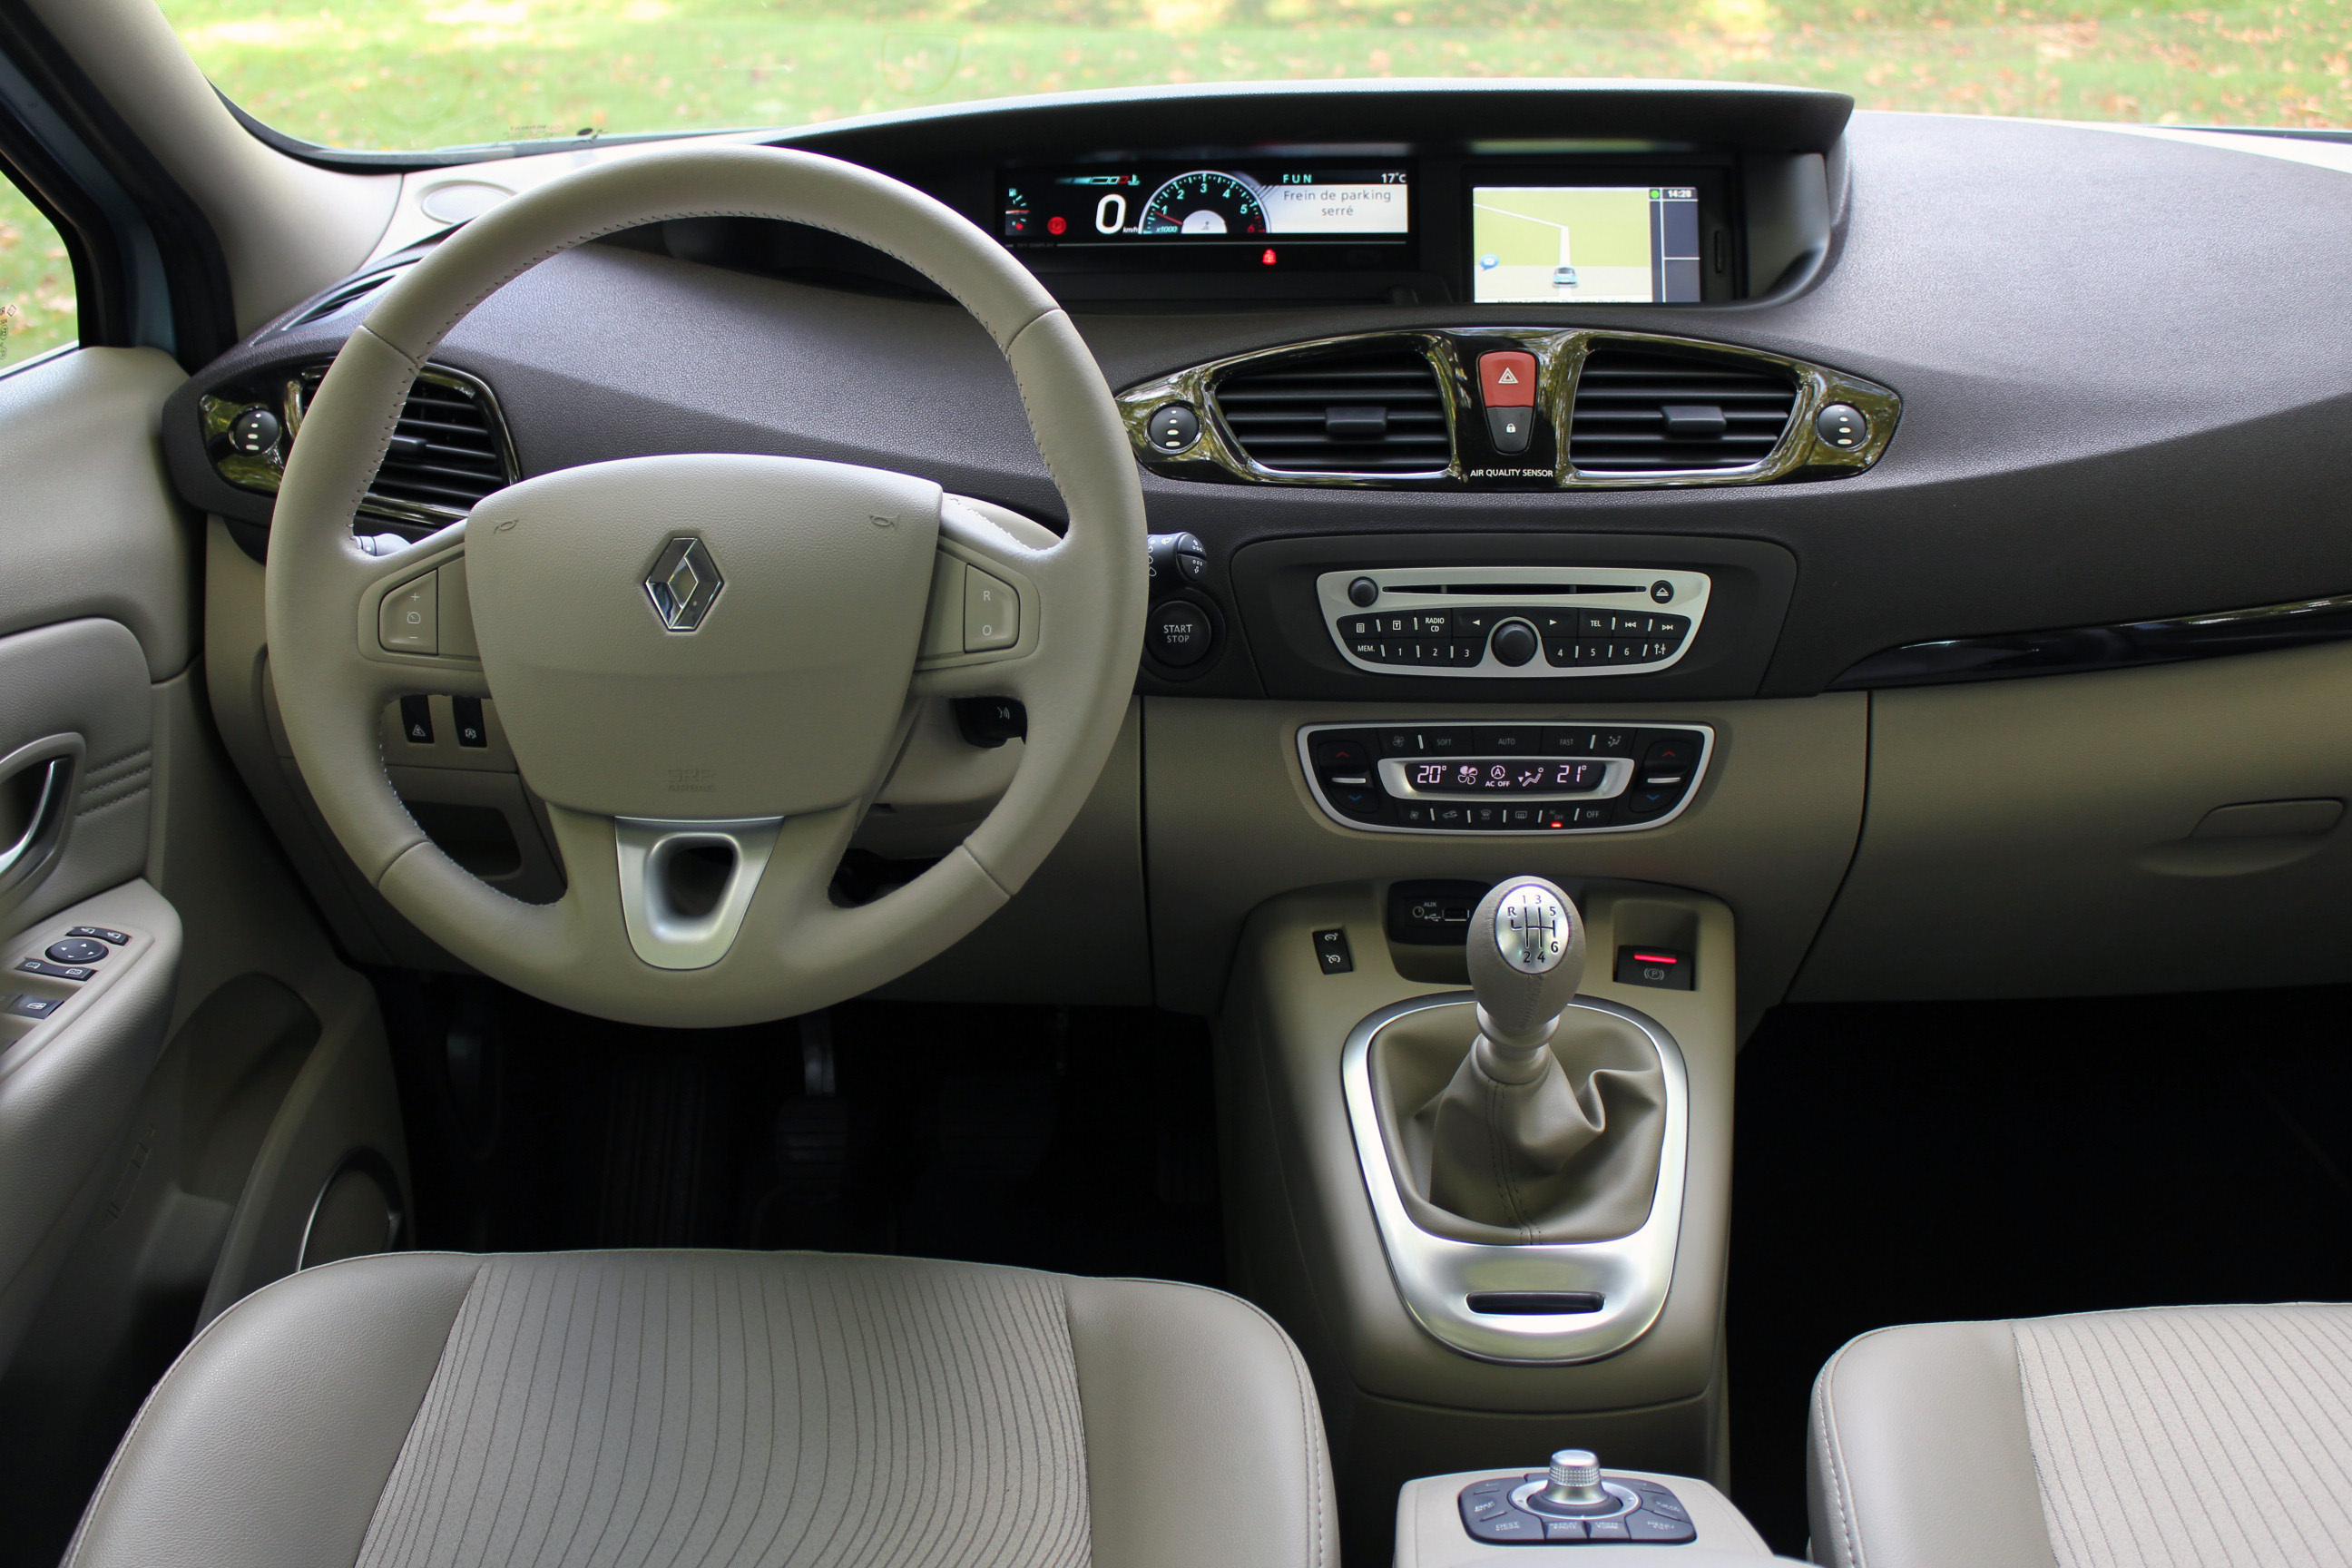 Comparatif Renault Sc 233 Nic Ford C Max Destination Famille